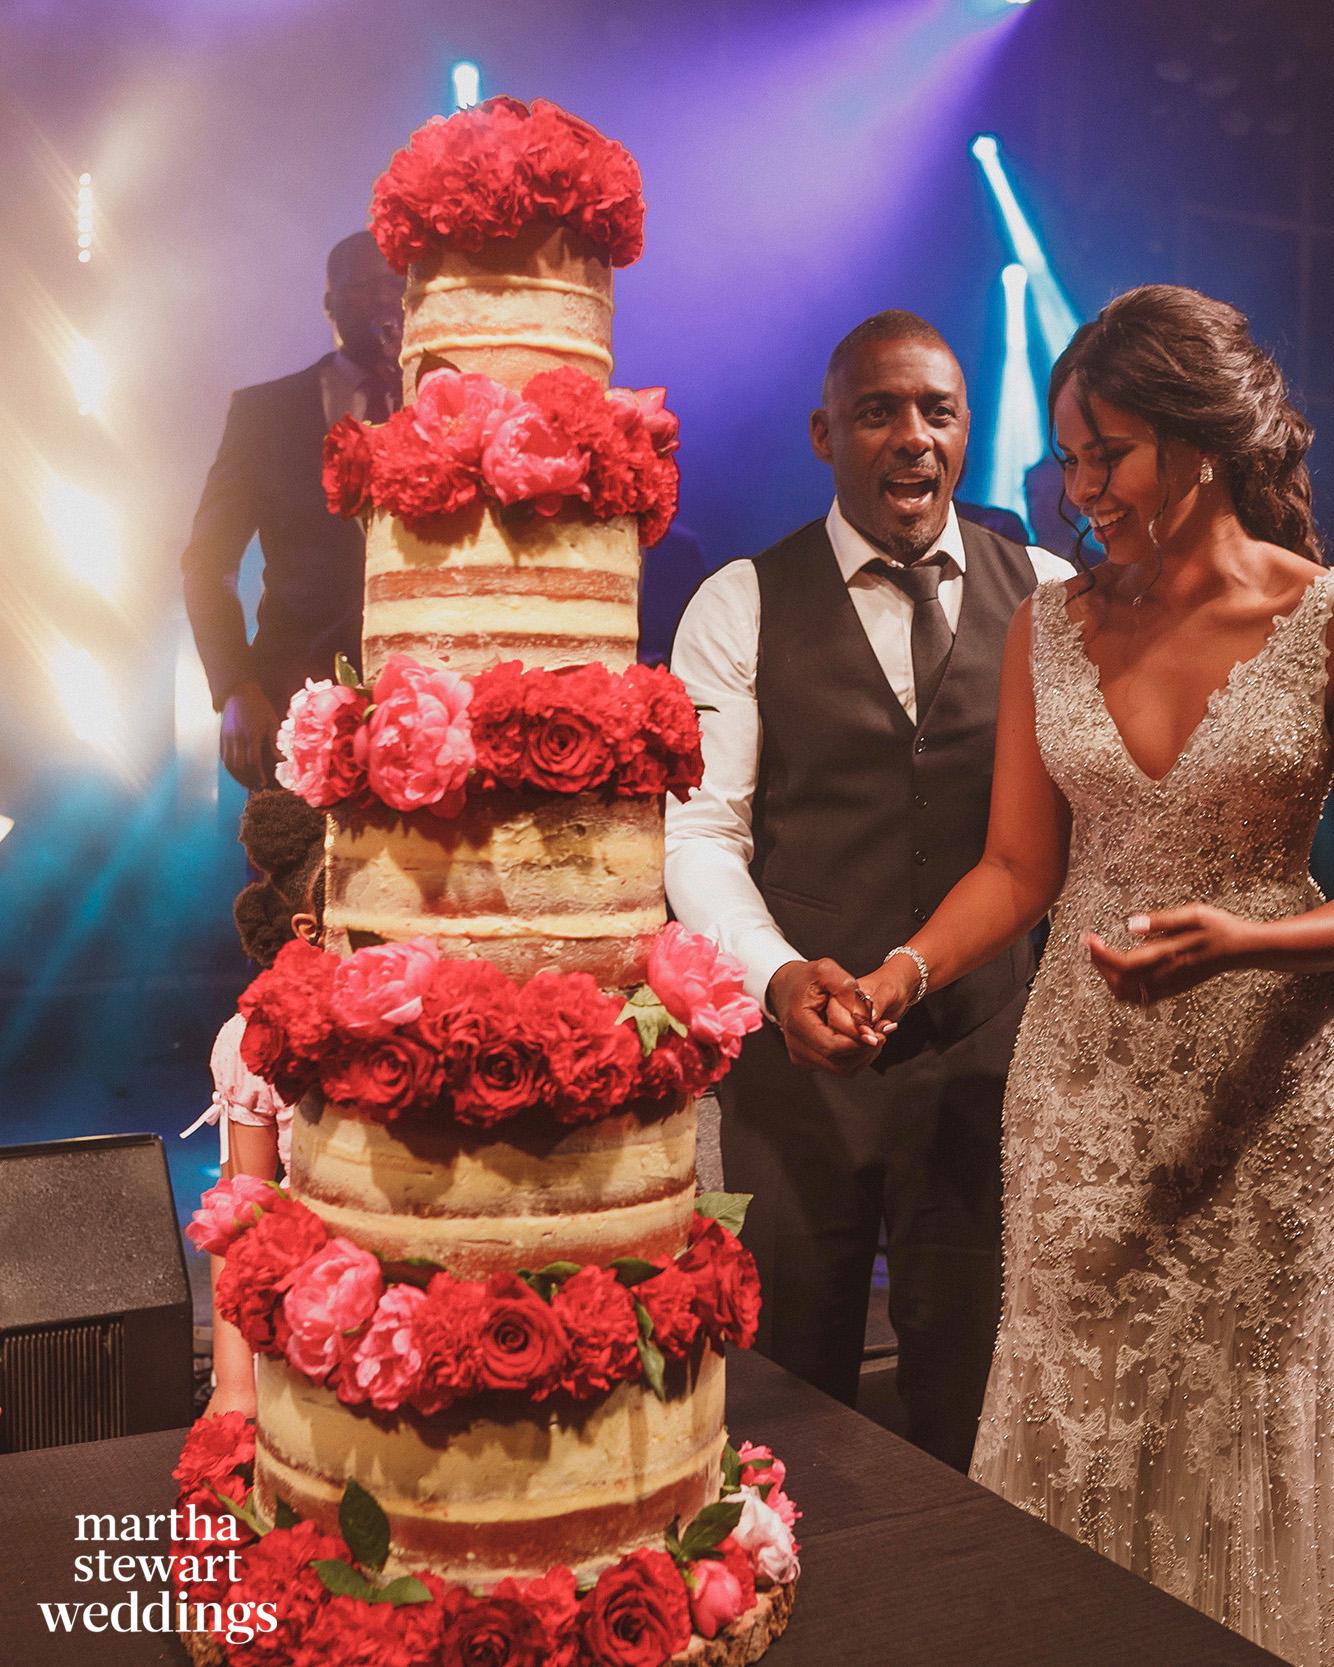 idris and sabrina elba cutting wedding cake